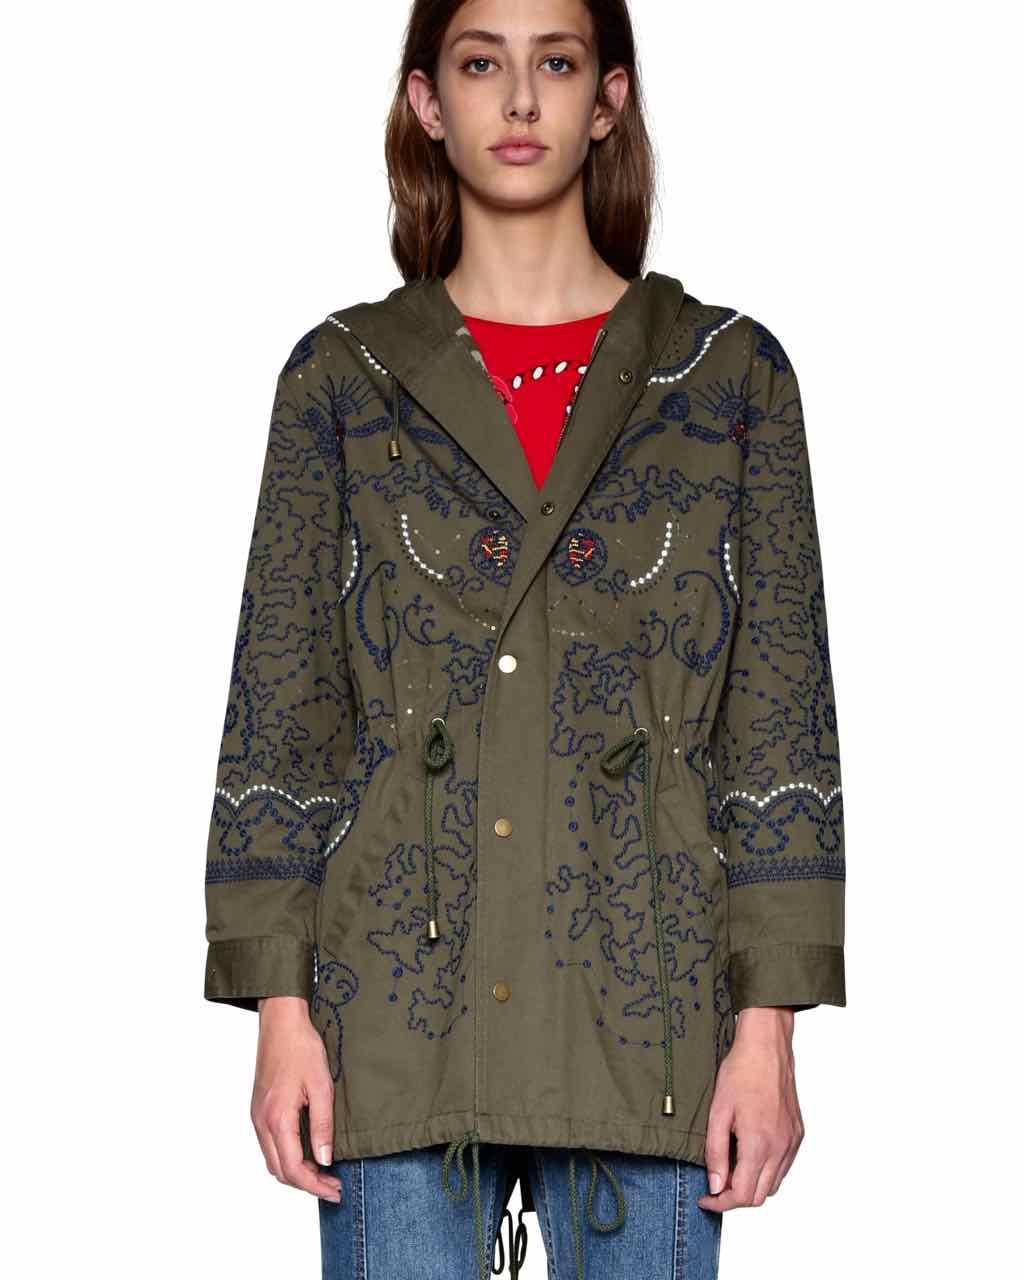 18SWEW60_4003 Desigual Coat Mariette Buy Online